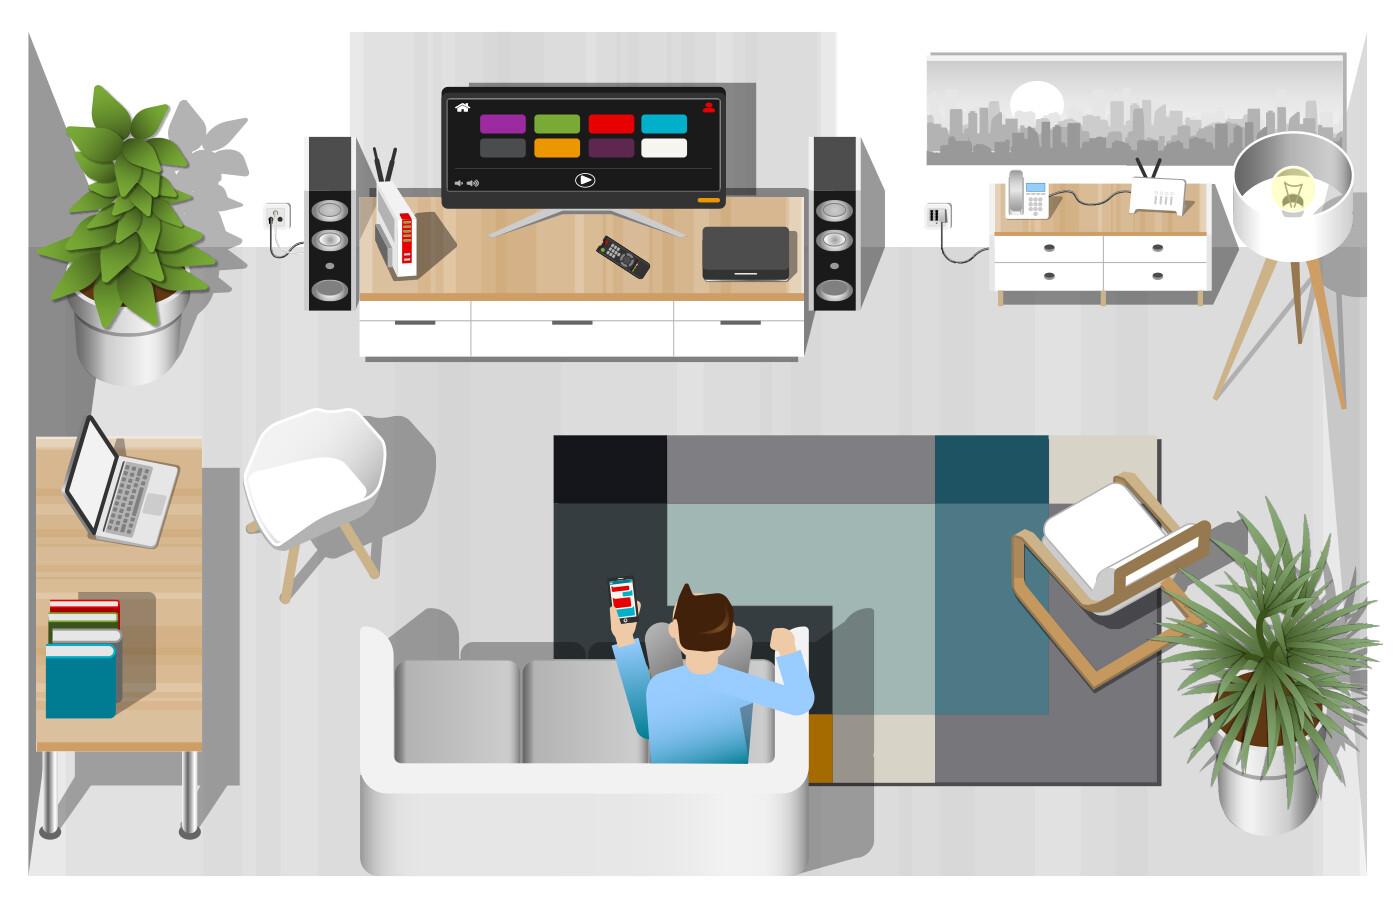 Home Entertainment - stylised vector illustration